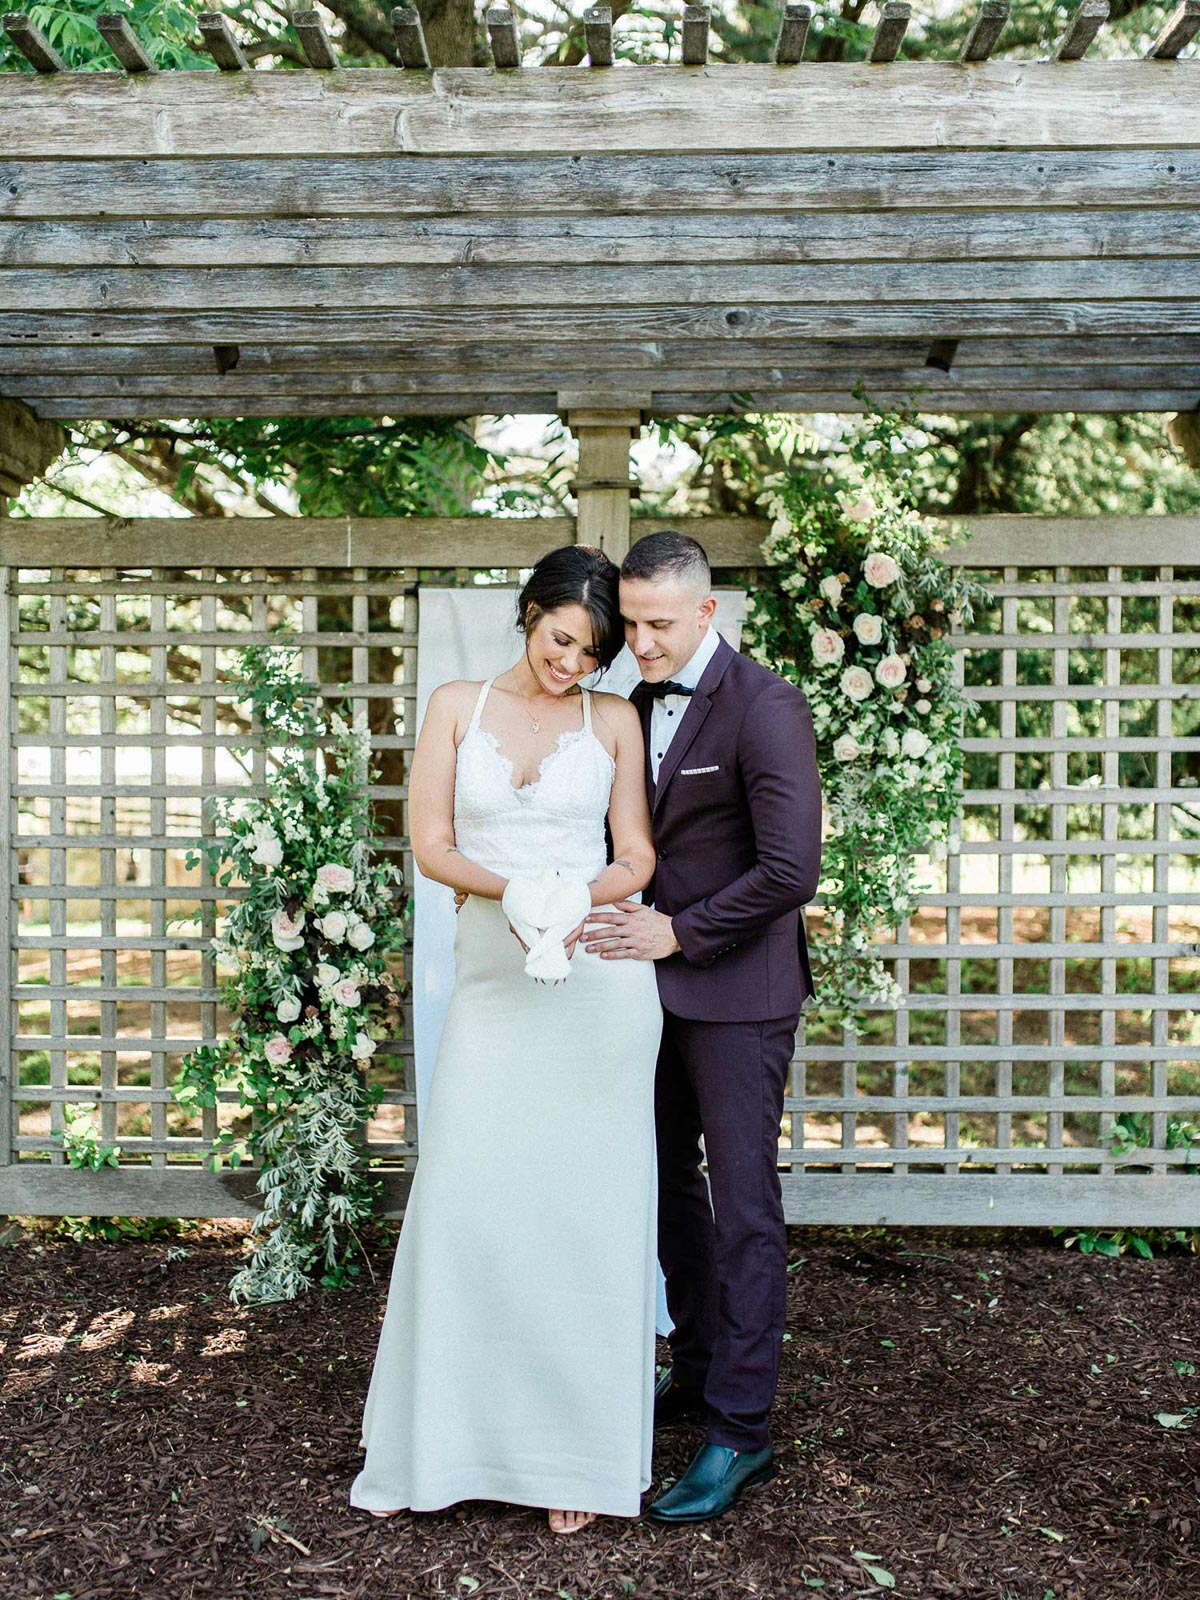 destiny-dawn-photography-vineyard-bride-swish-list-knollwood-golf-and-country-club-ancaster-wedding-editorial-4.jpg